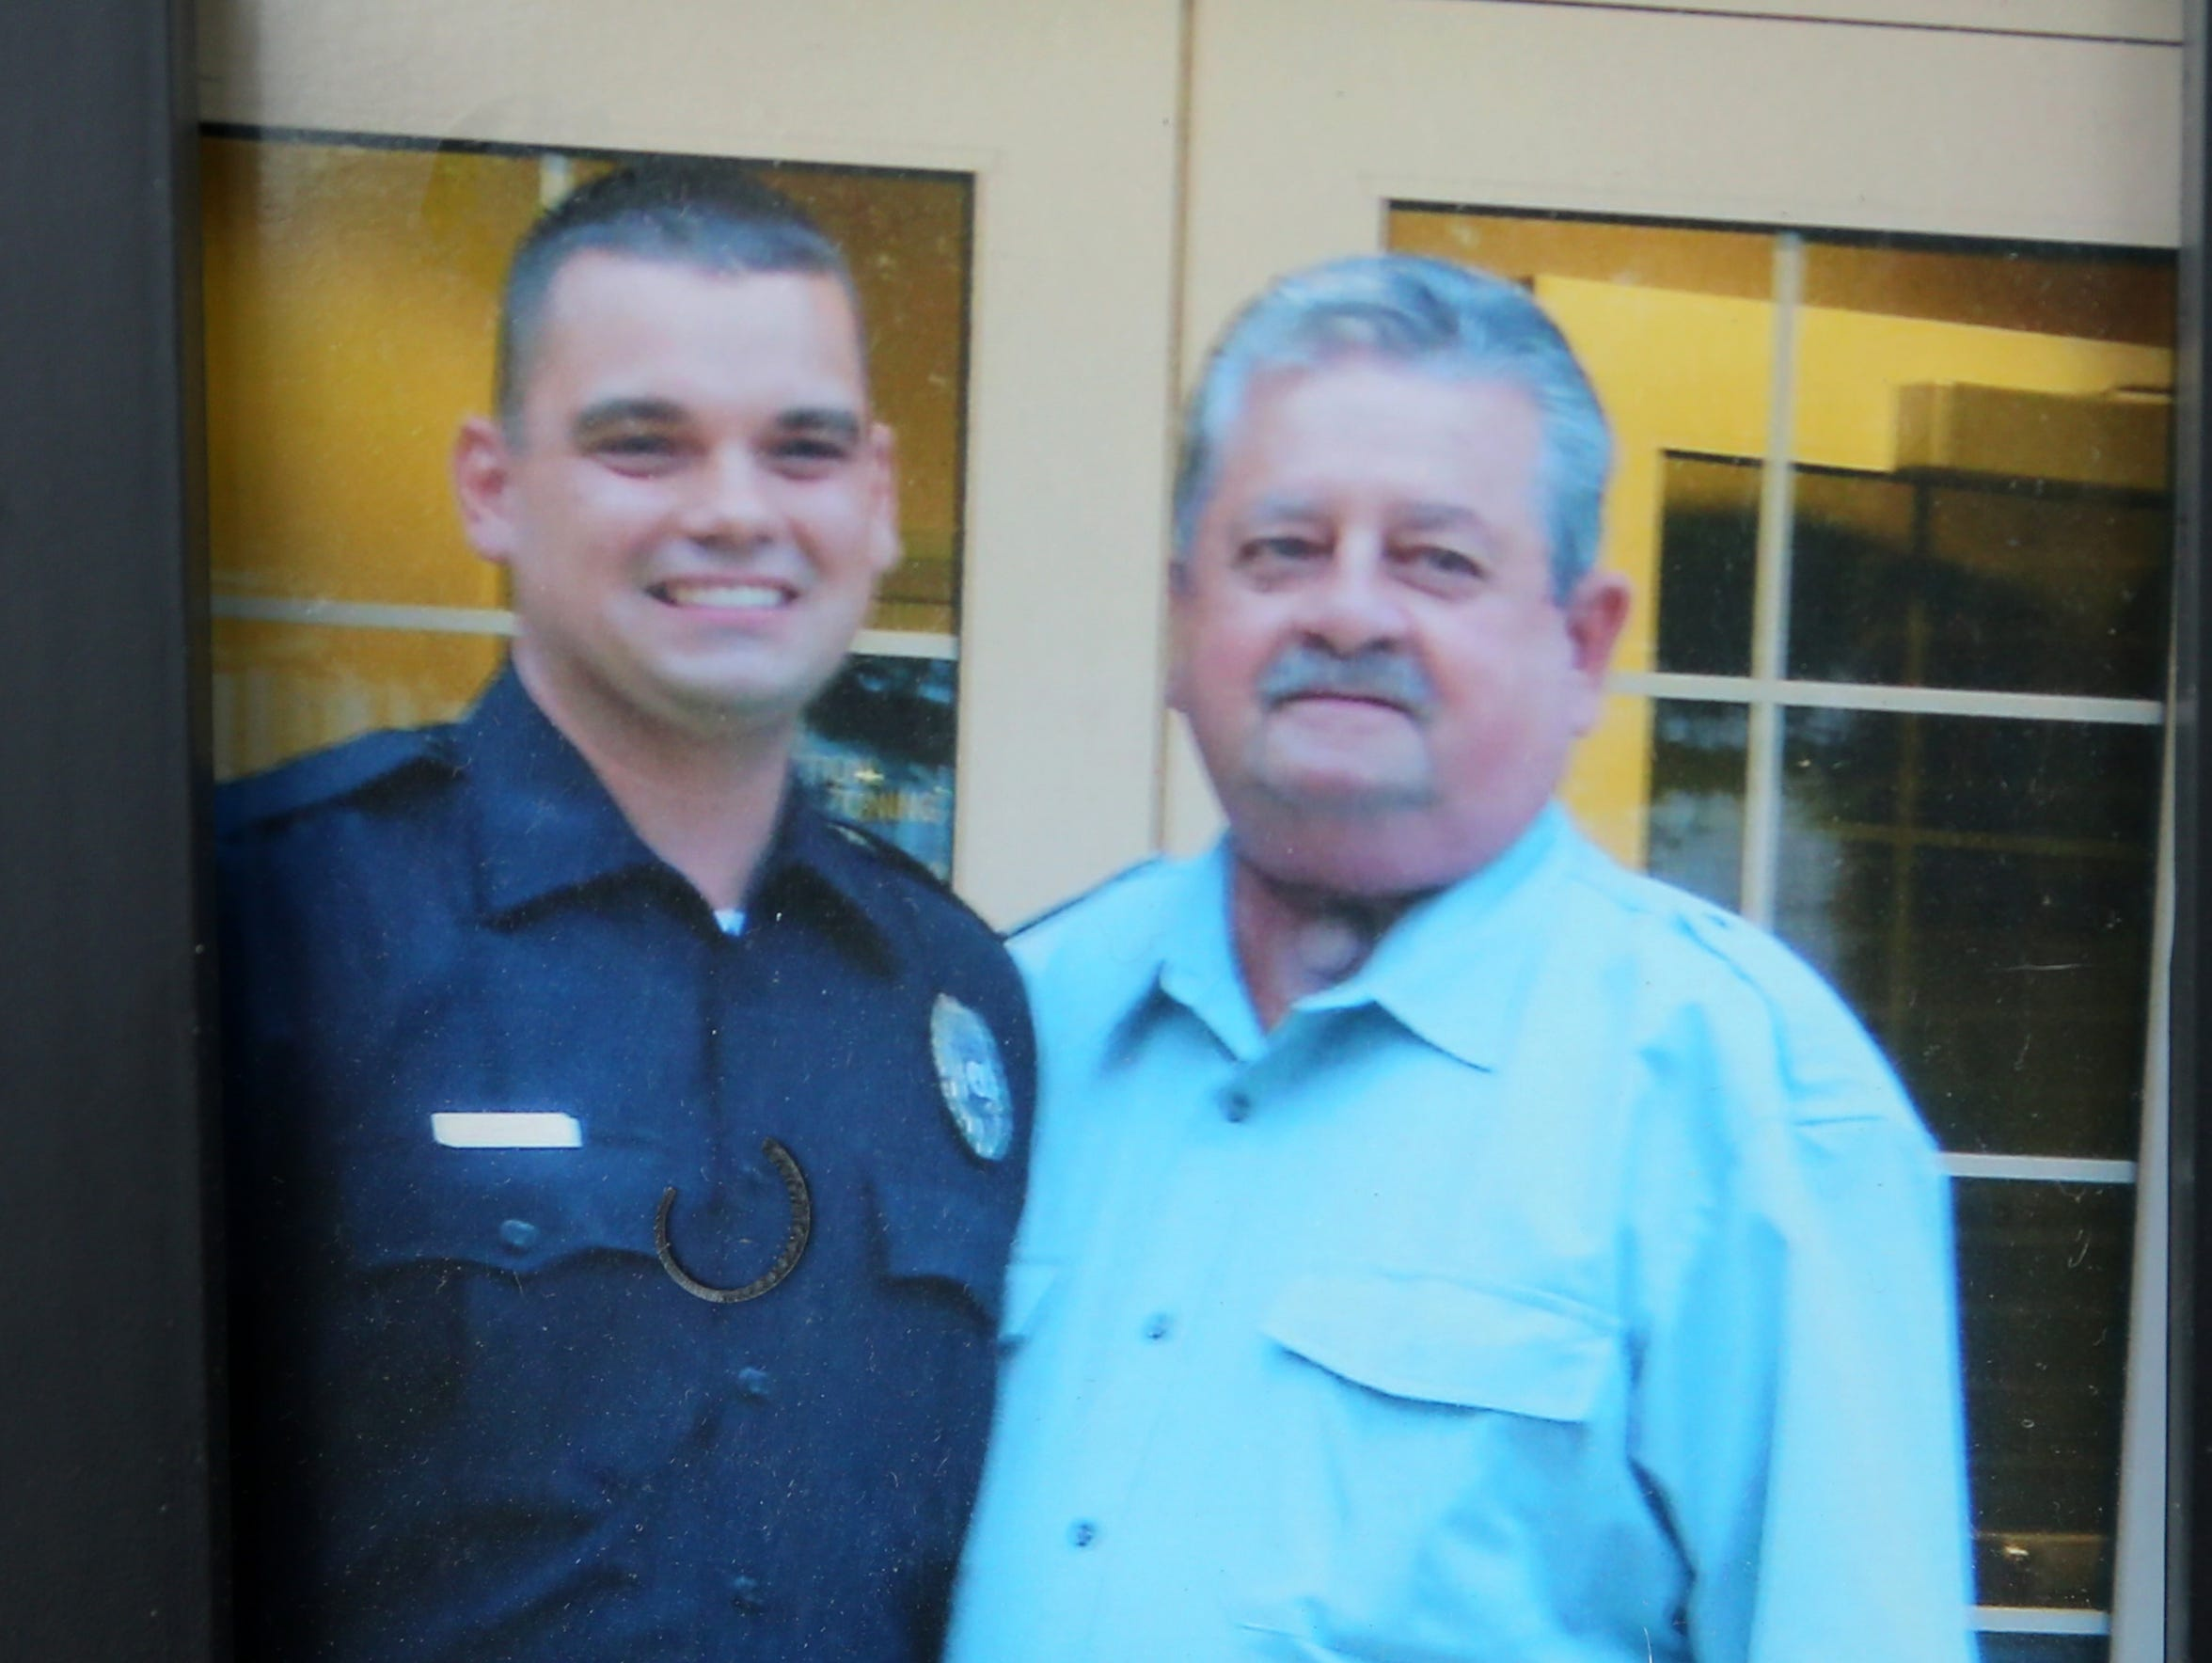 Joseph Wenskoski with his father, retired Edison Police Officer Richie Wenskoski.